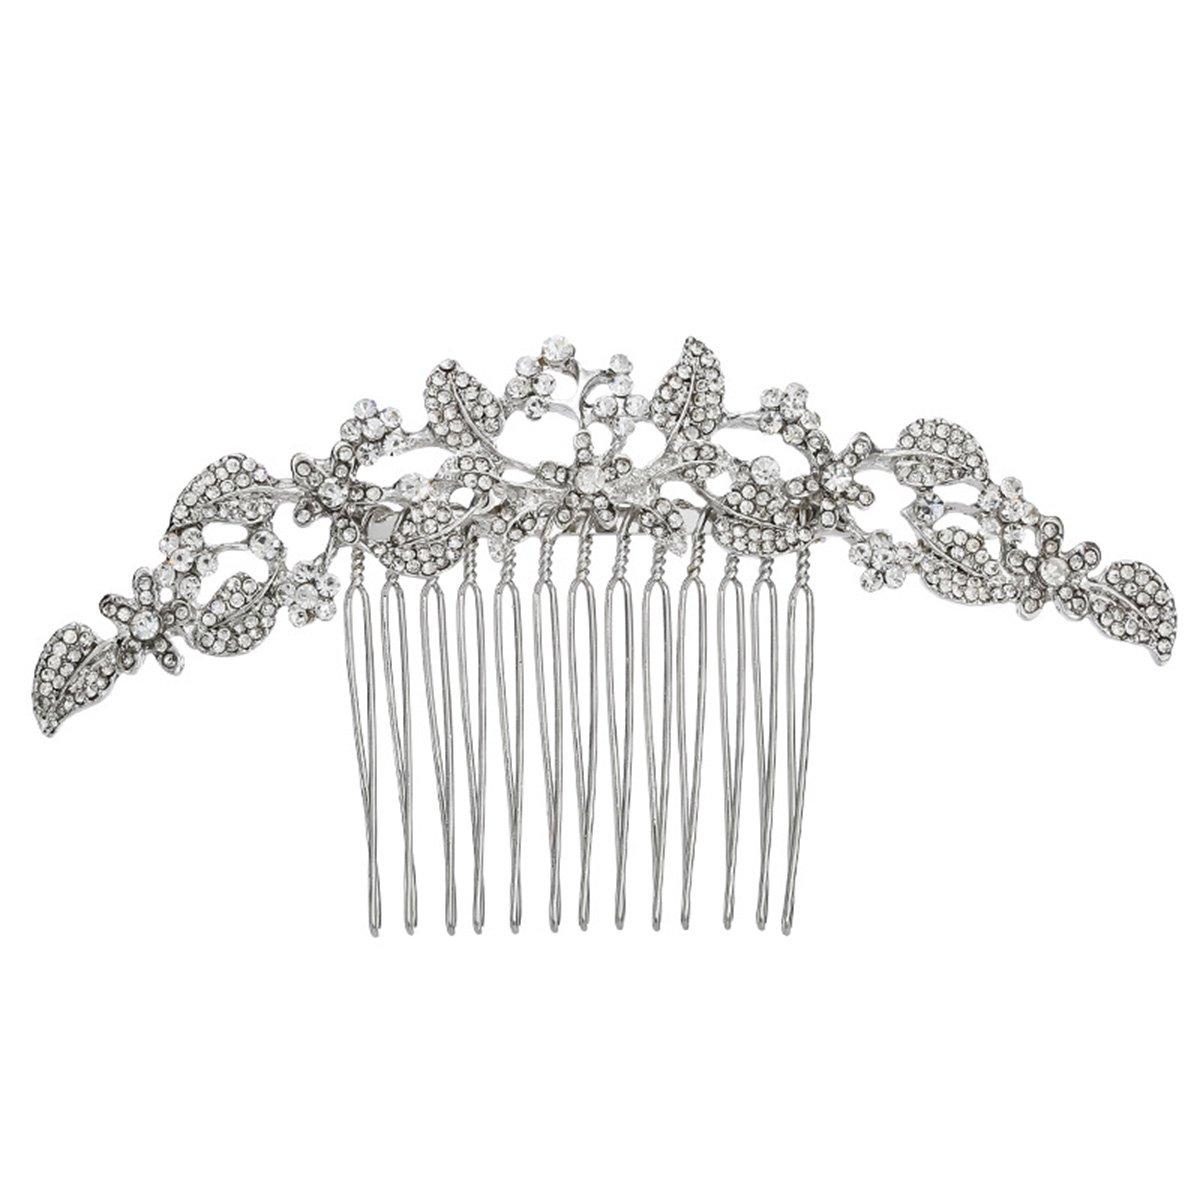 Frcolor Crystal Rhinestone Bridal Wedding Hair Combs Wedding or Prom Hair Comb Accessory (Silver)